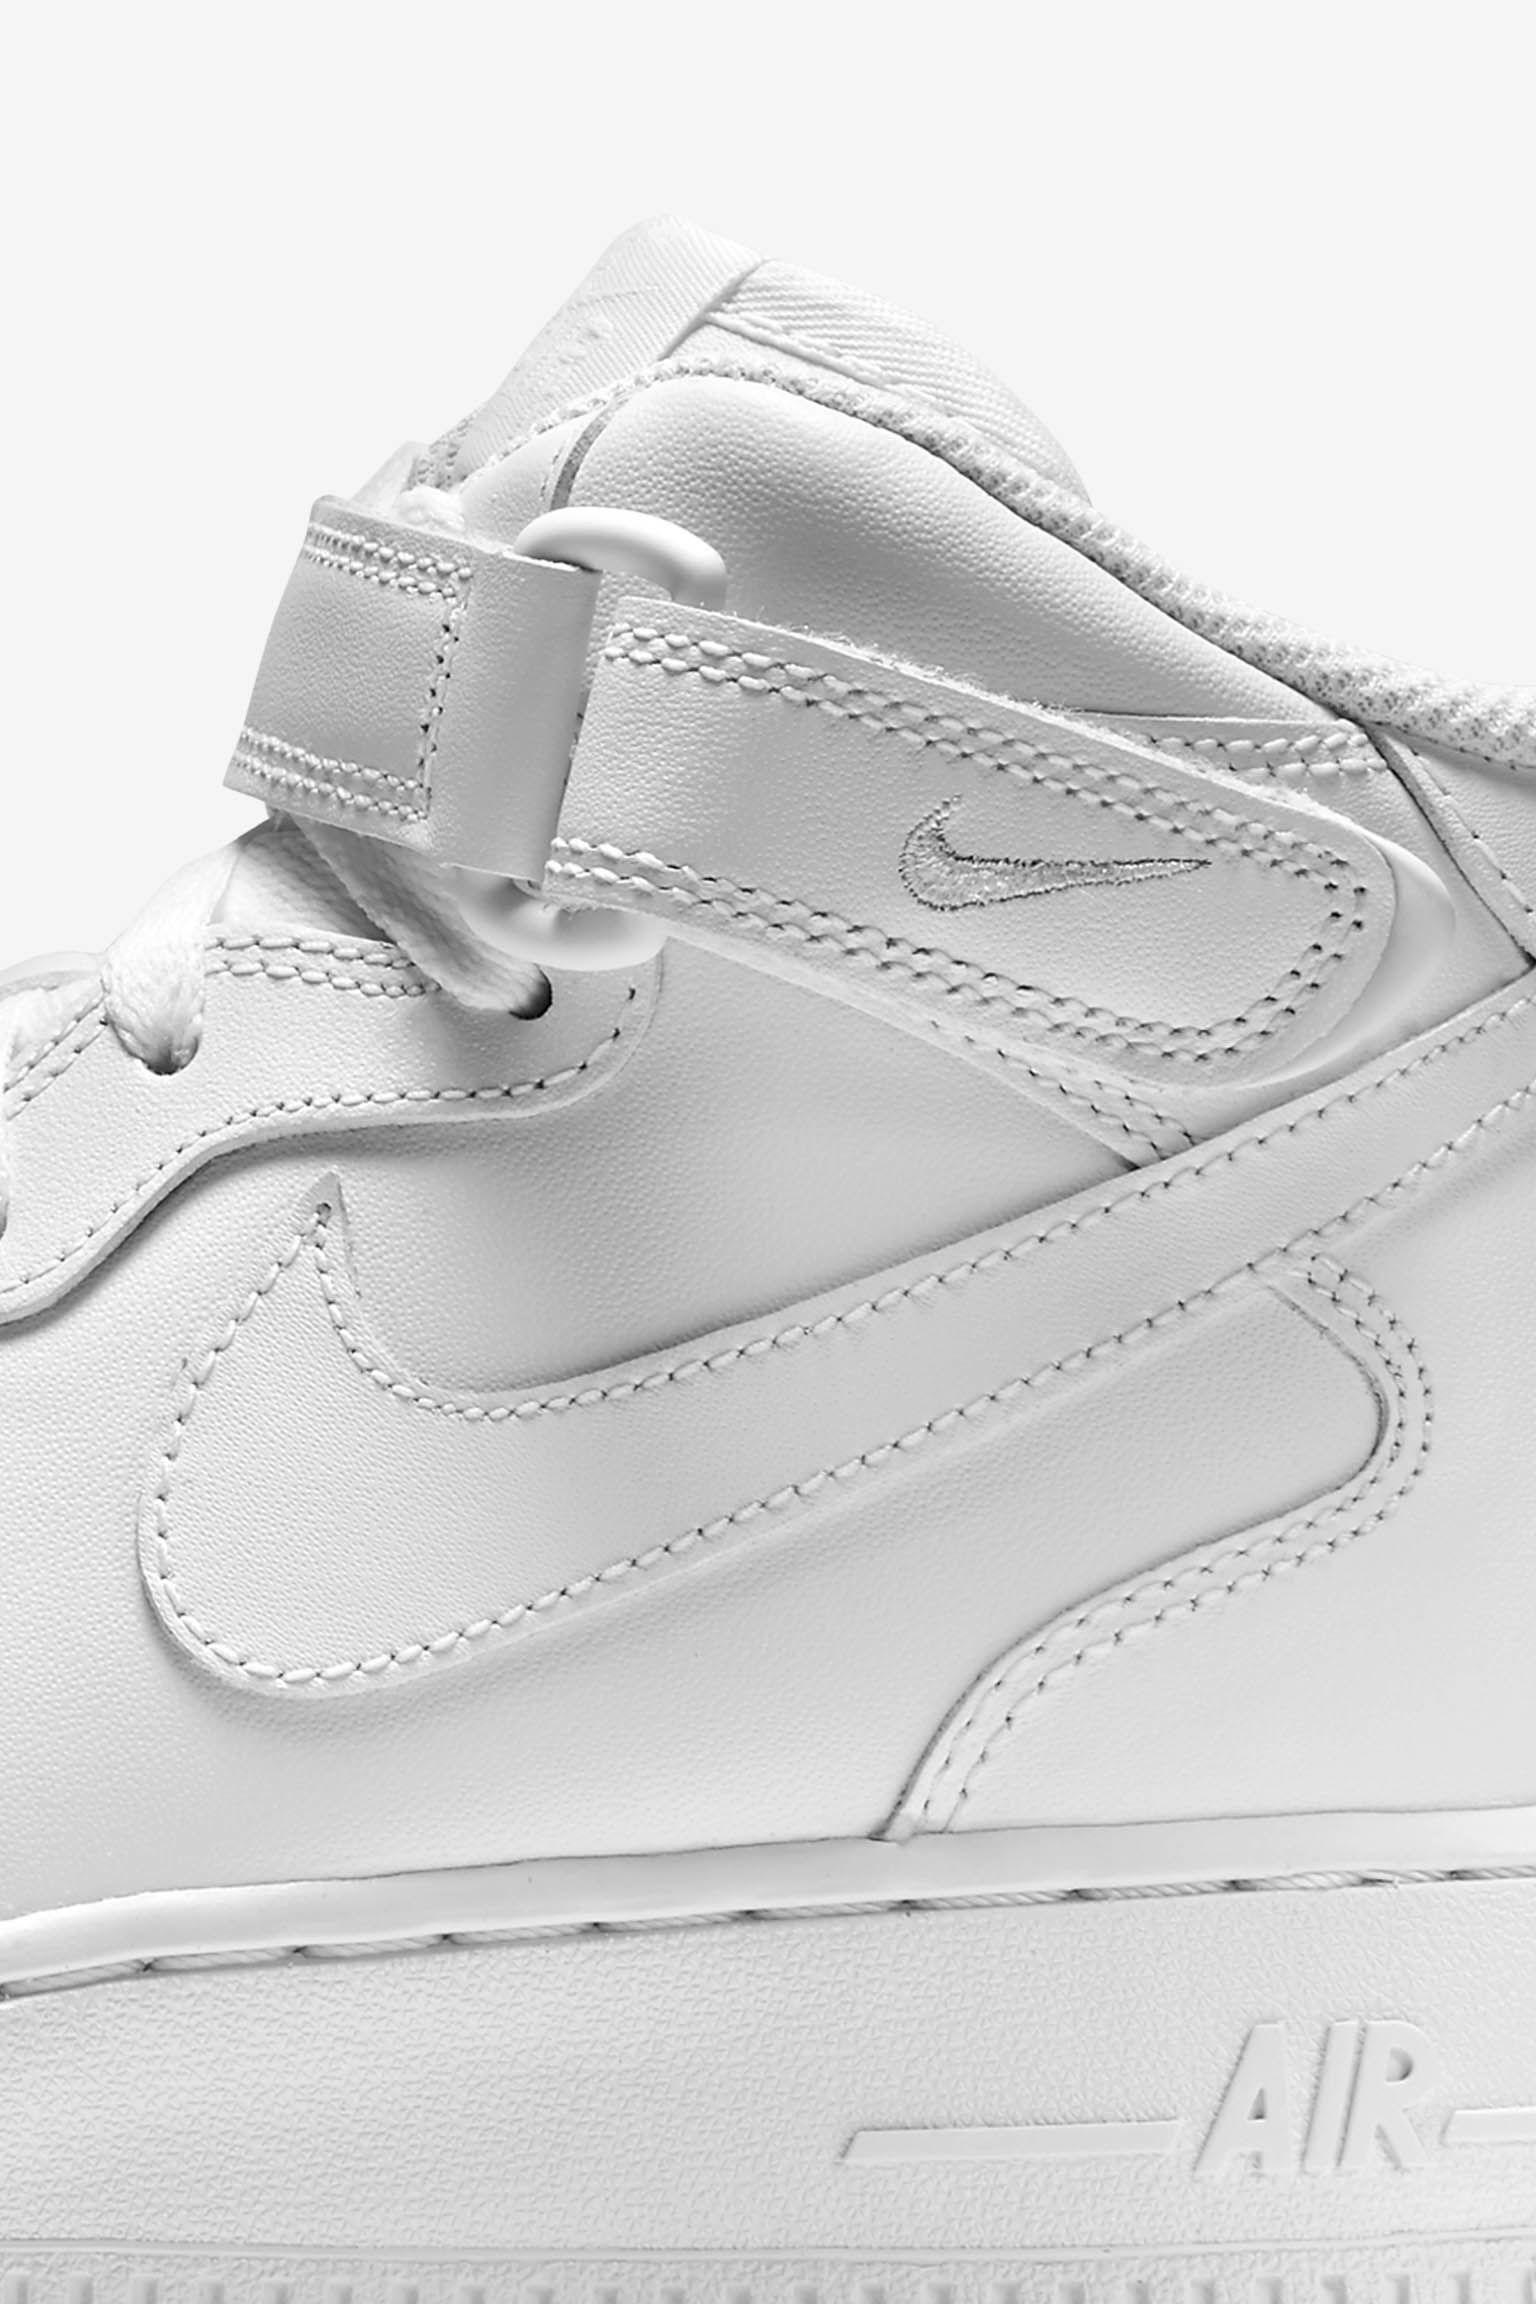 Women's Nike Air Force 1 Mid 'Triple White'. Nike SNKRS